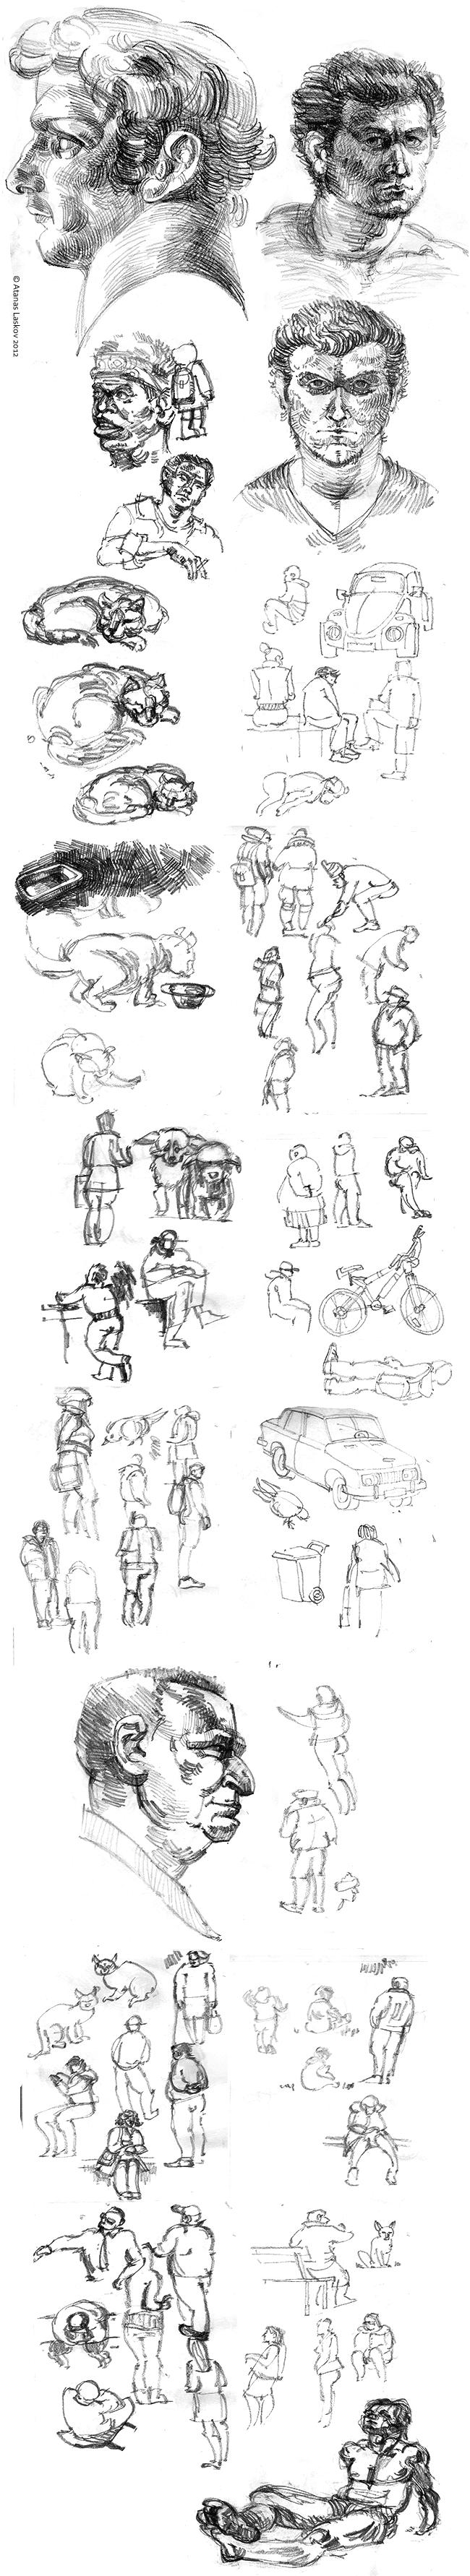 laskov-sketch-compil